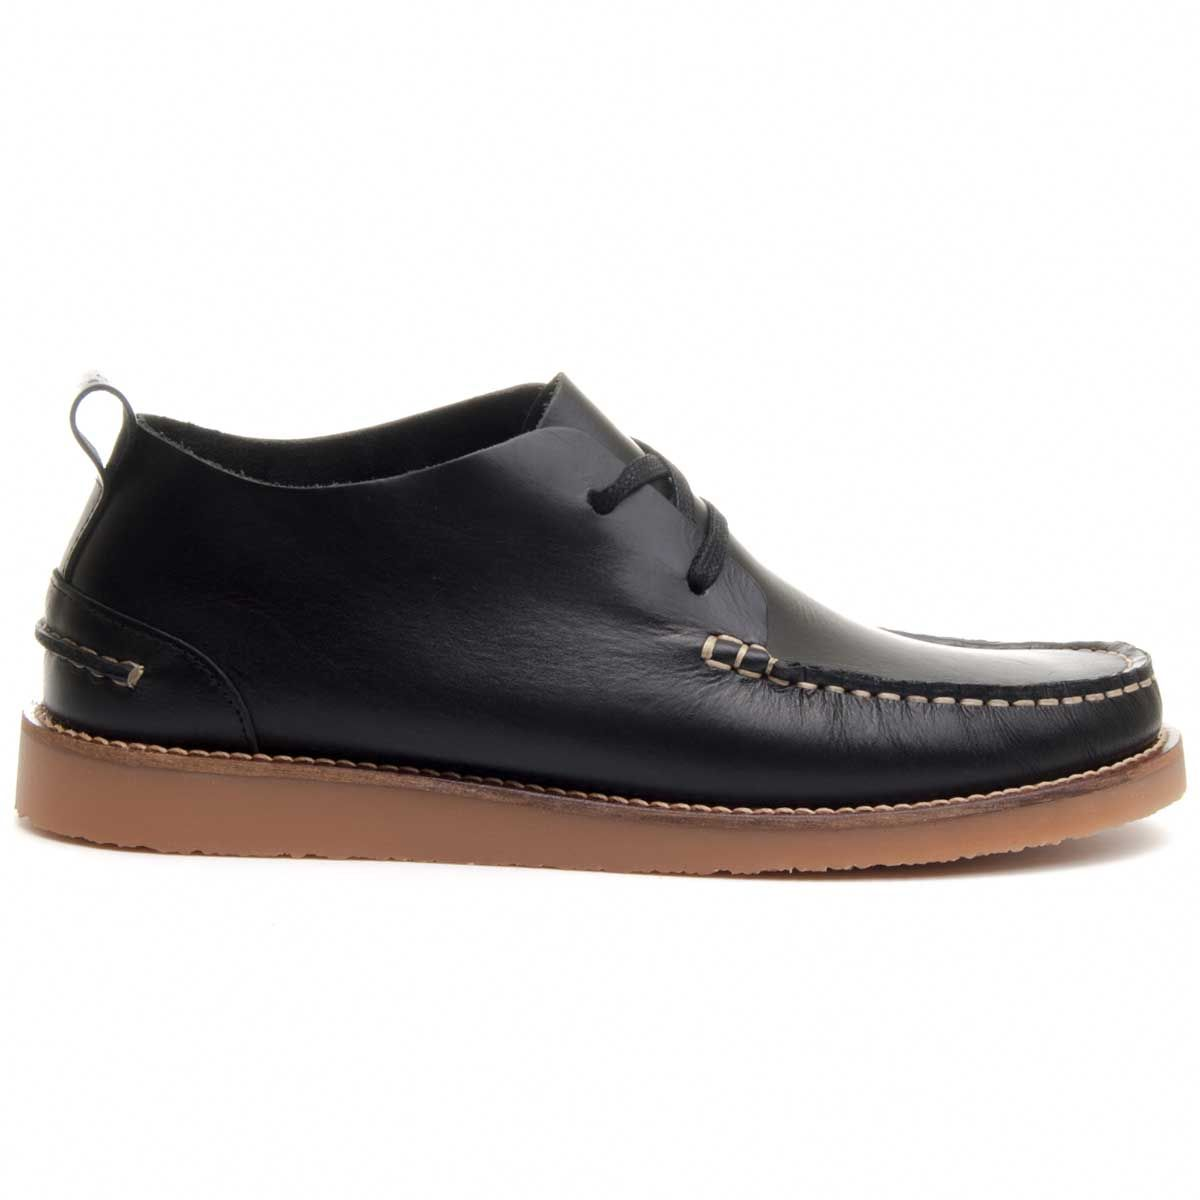 Purapiel Chukka Boot in Black